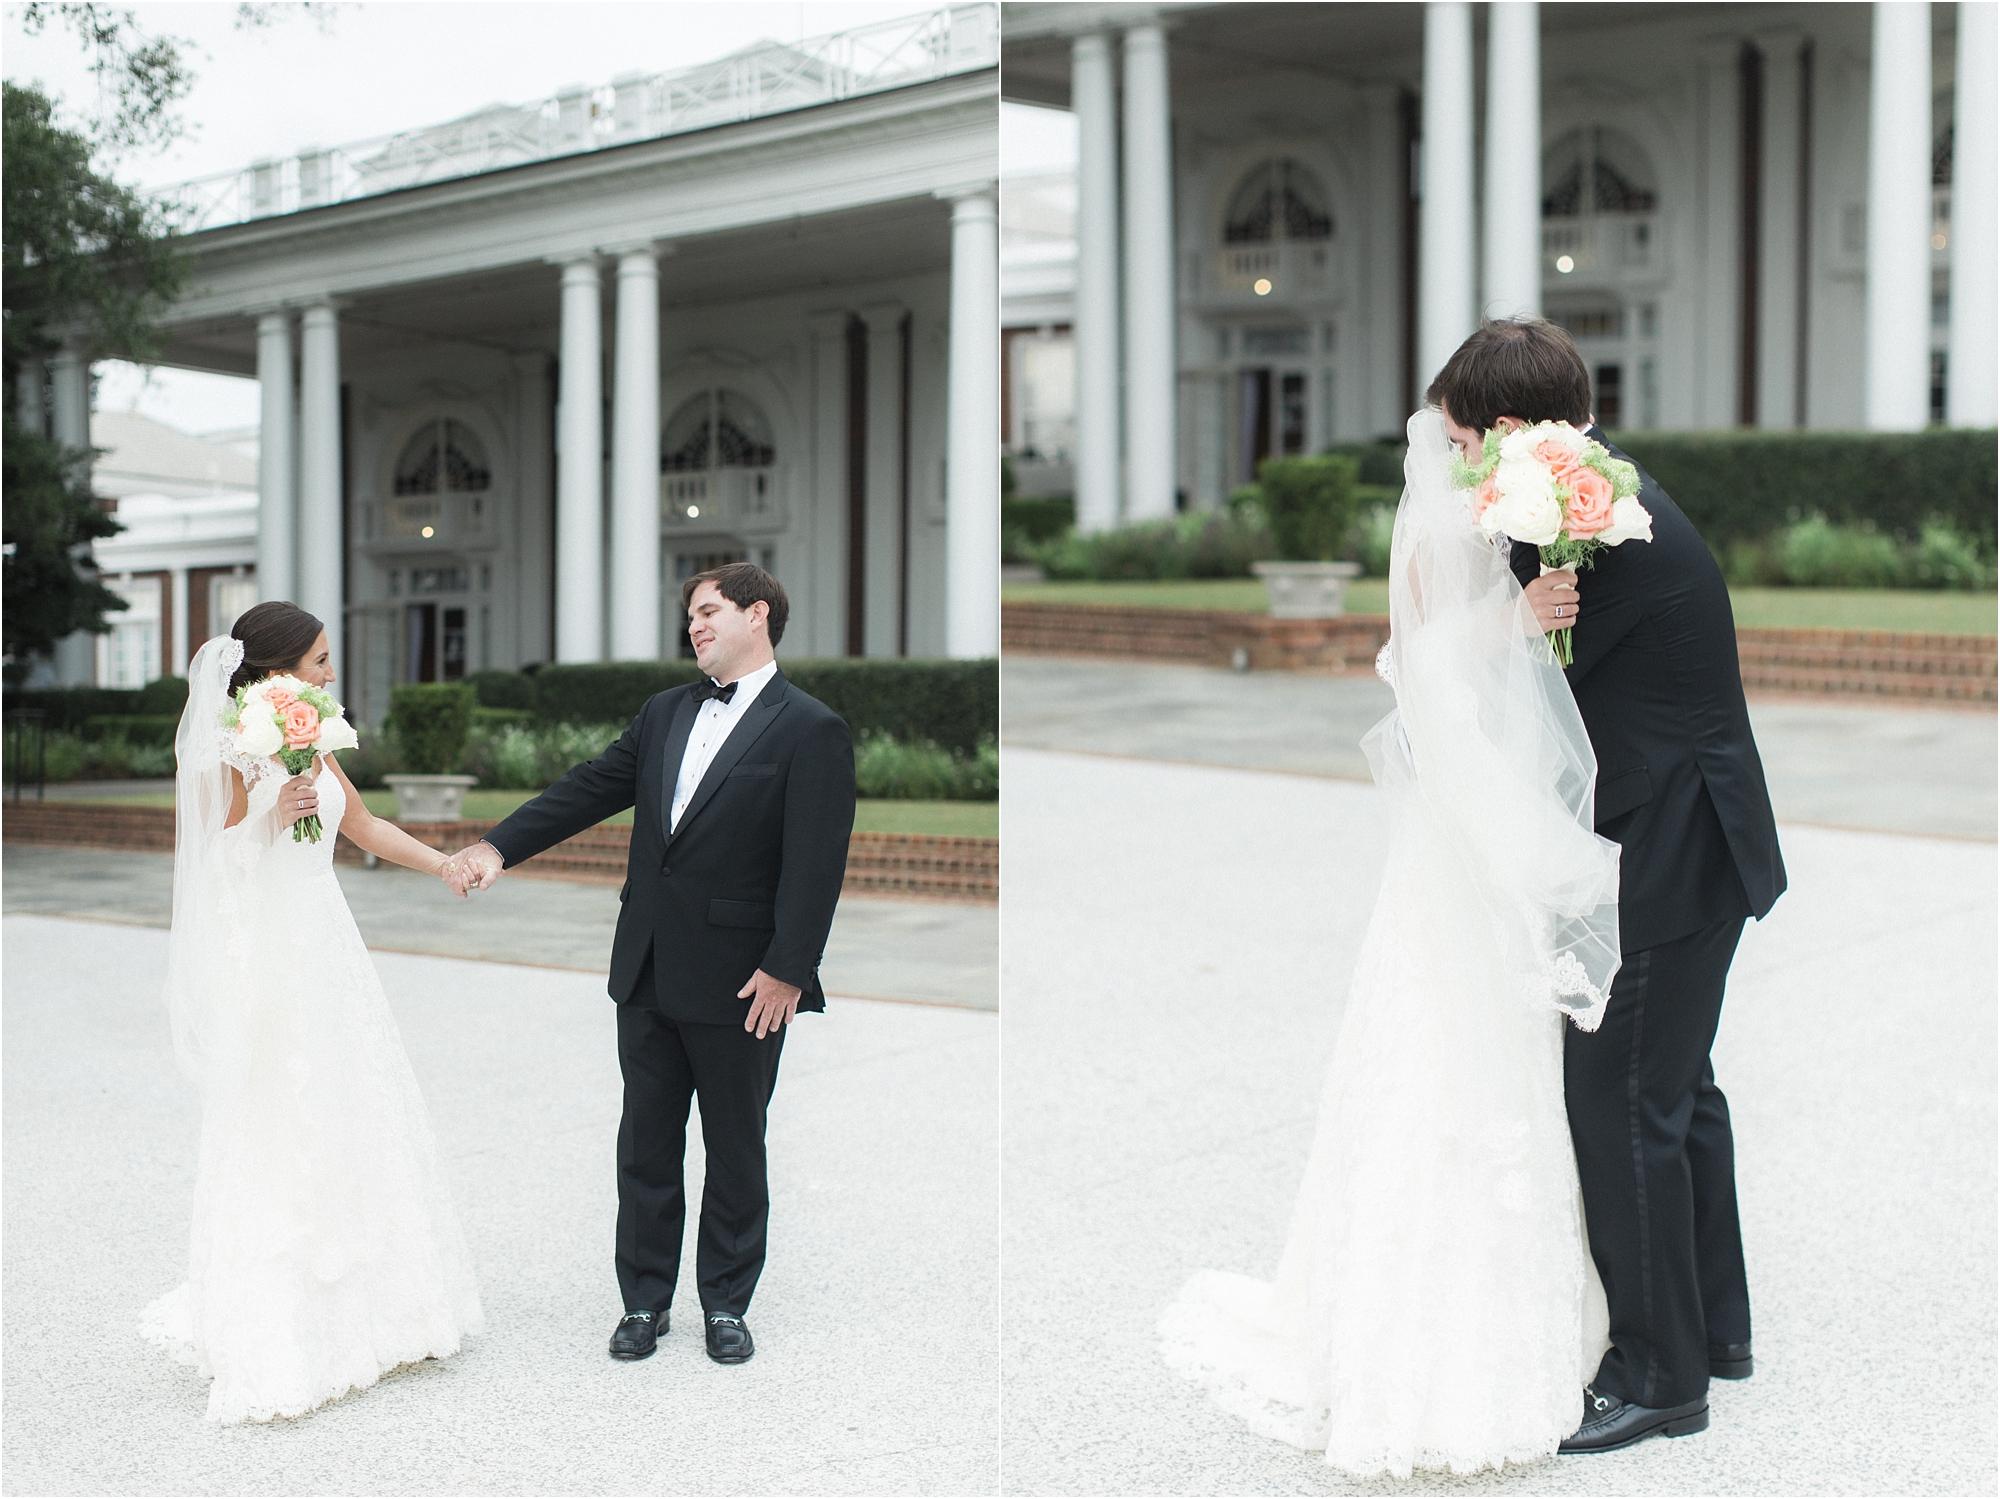 stephanie-yonce-photography-richmond-virginia-country-club-wedding-photo_014.JPG